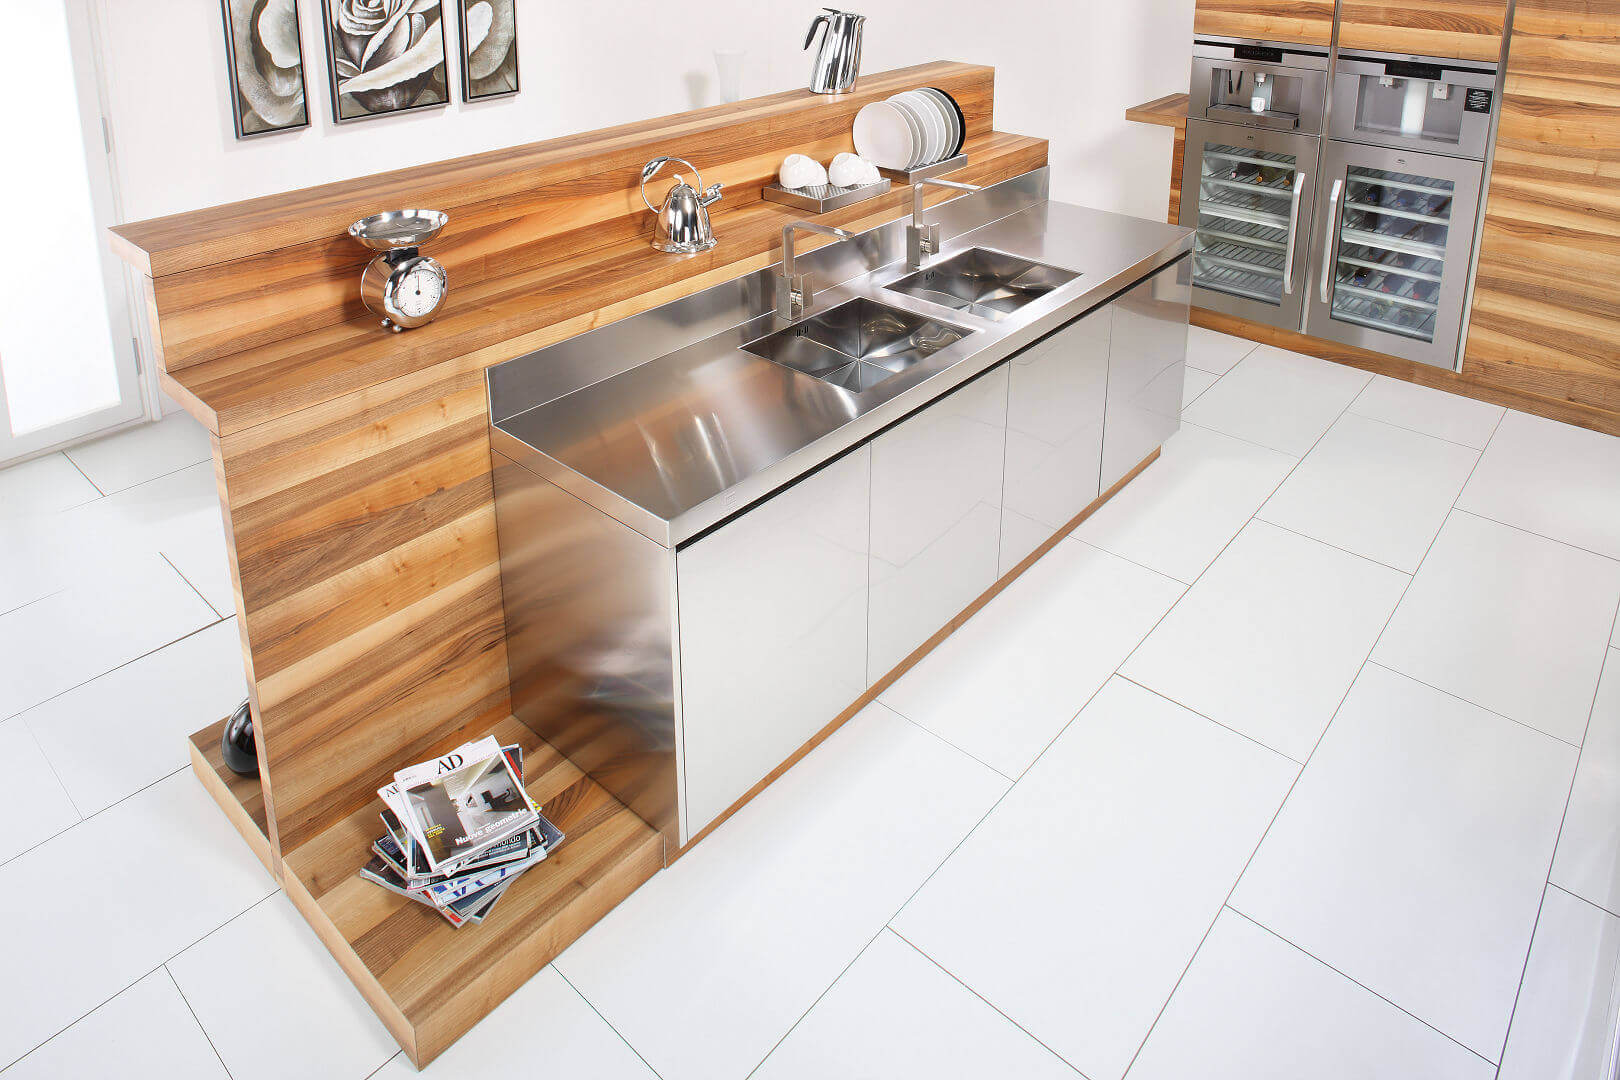 Emejing piano cucina acciaio inox images home interior ideas - Cucine alpes inox prezzi ...